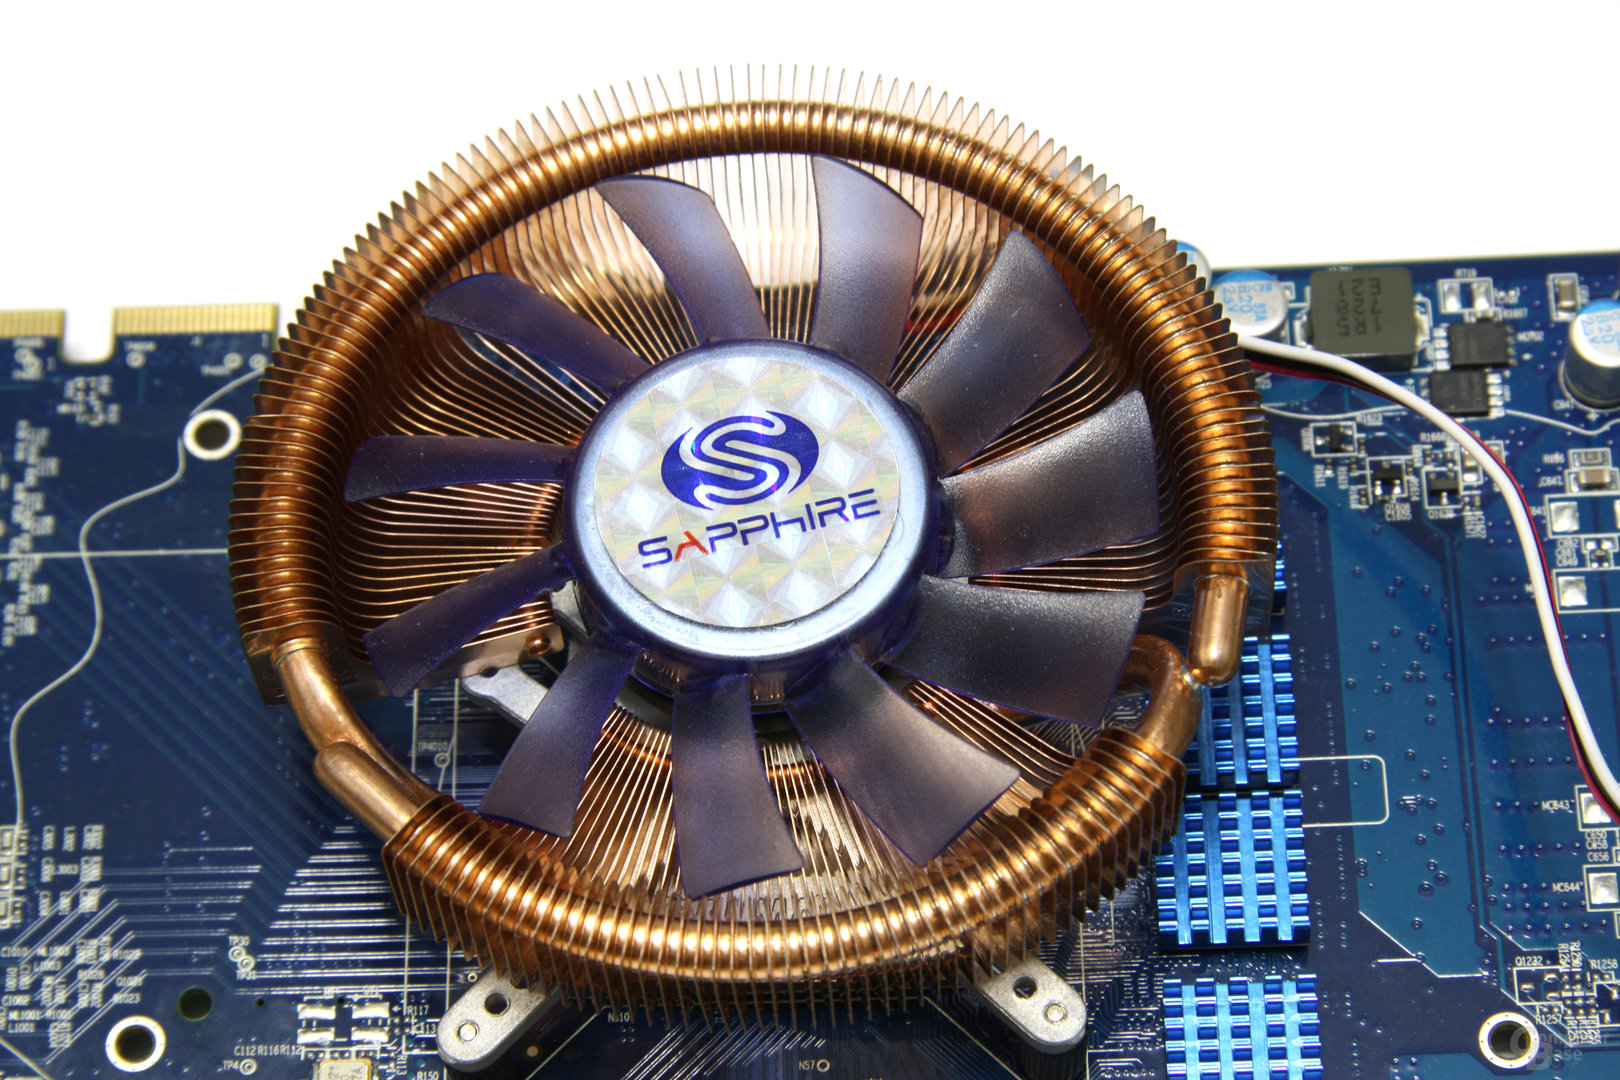 Radeon HD 4850 Toxic Lüfter